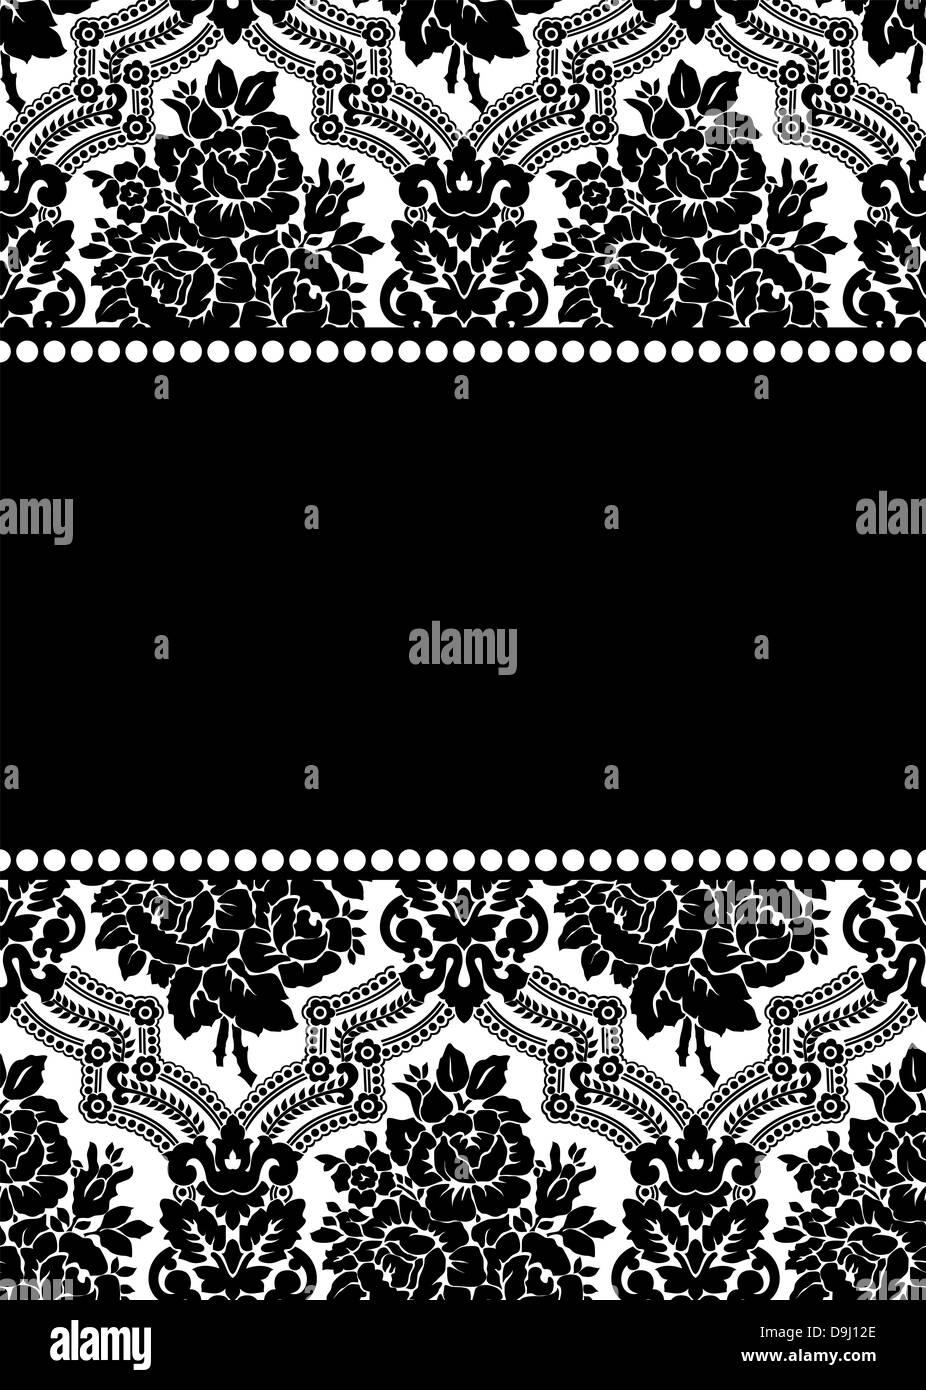 Vector damask frame Stock Photo: 57558998 - Alamy